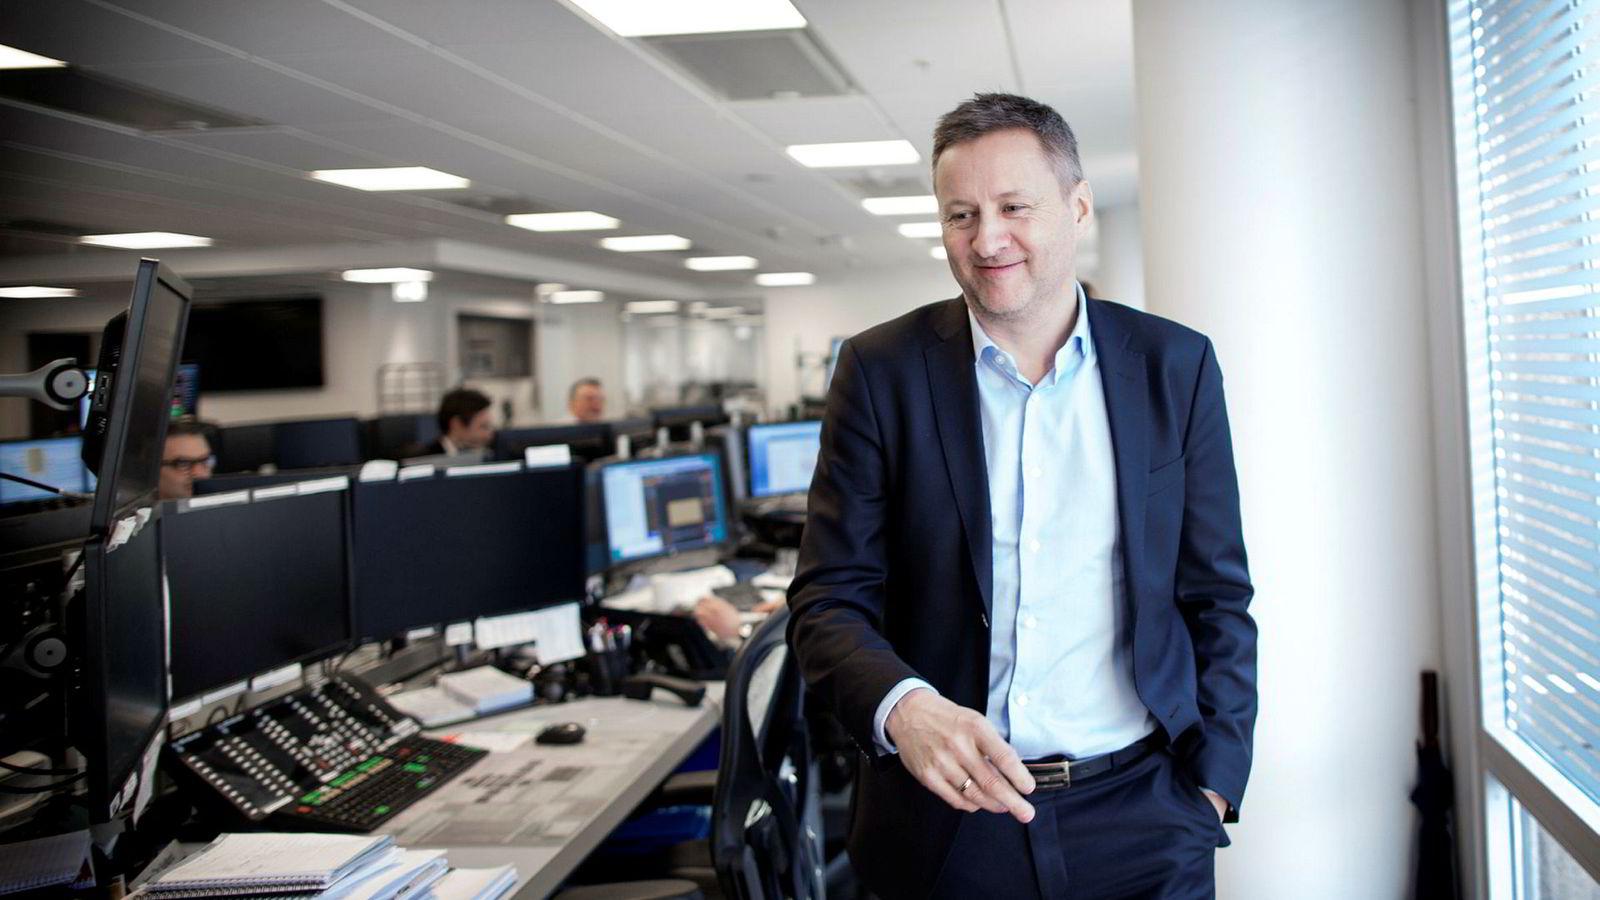 Sjeføkonom Frank Jullum i Danske Bank tror Norges Bank vil heve rentene i 2019.